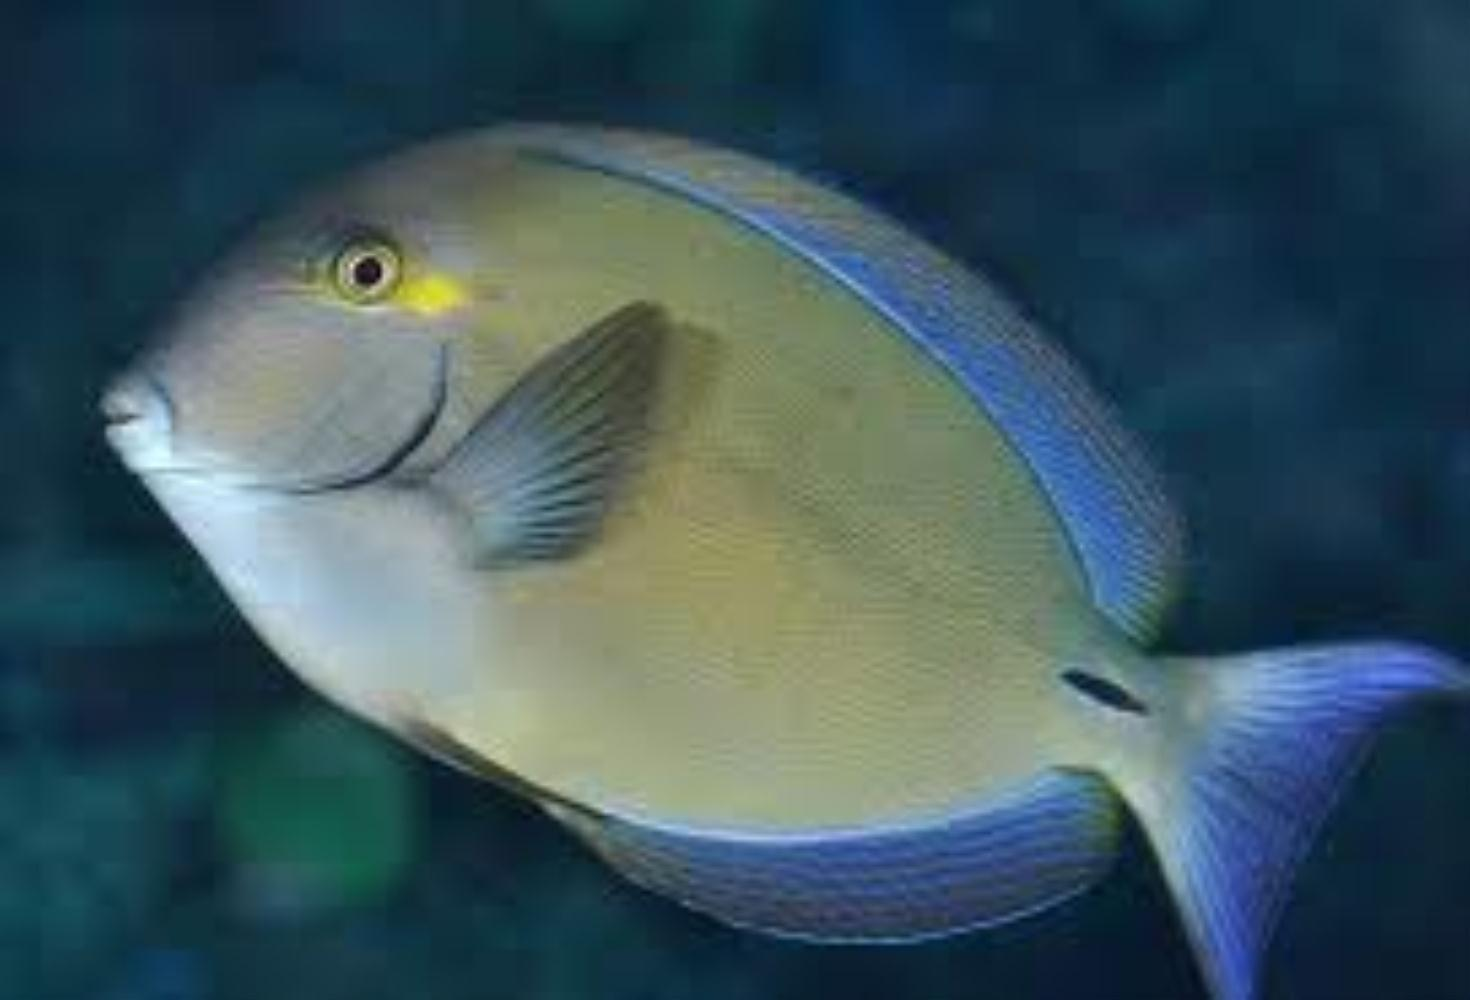 Ringtailed surgeonfish